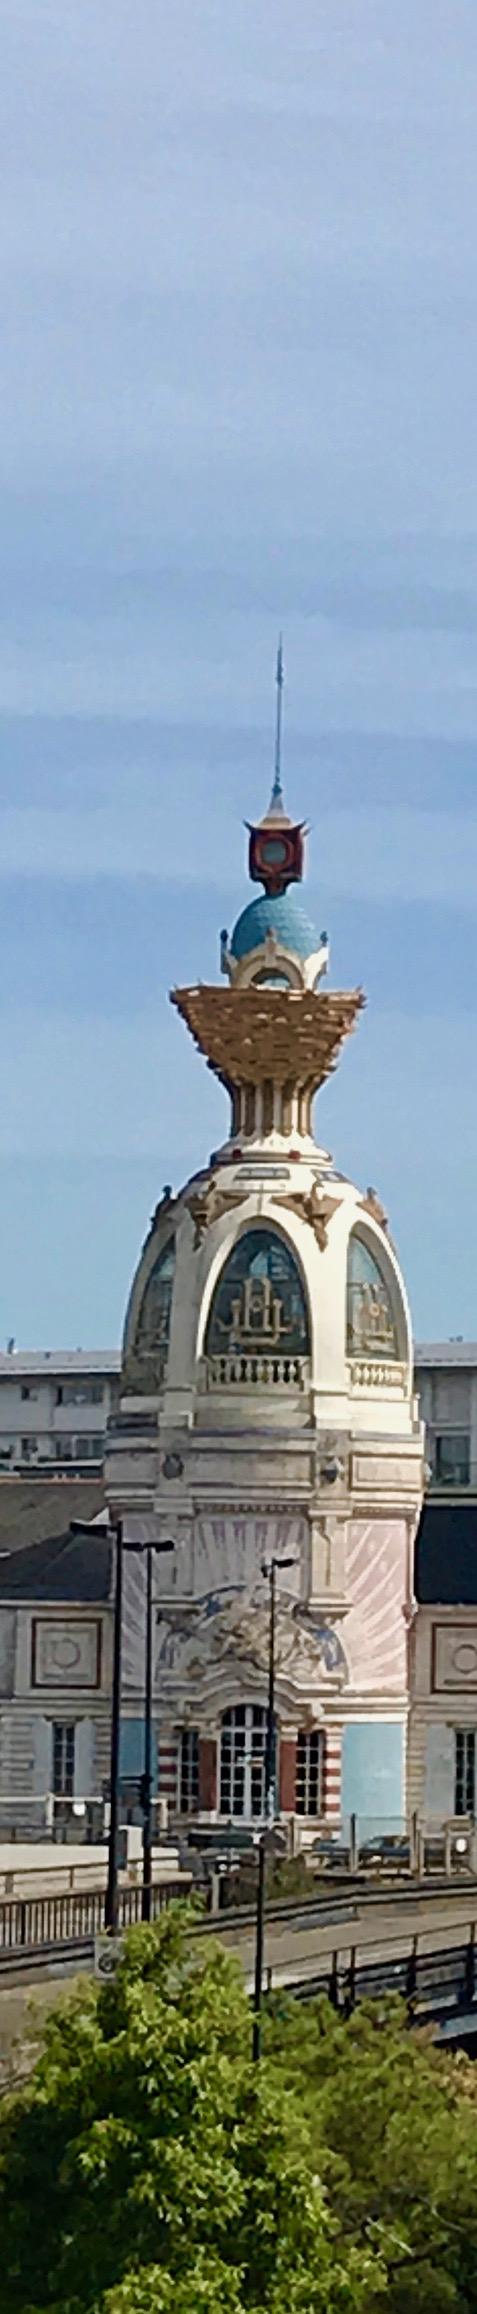 BALADE - De Nantes à Montaigu, la digue, la digue... 2412